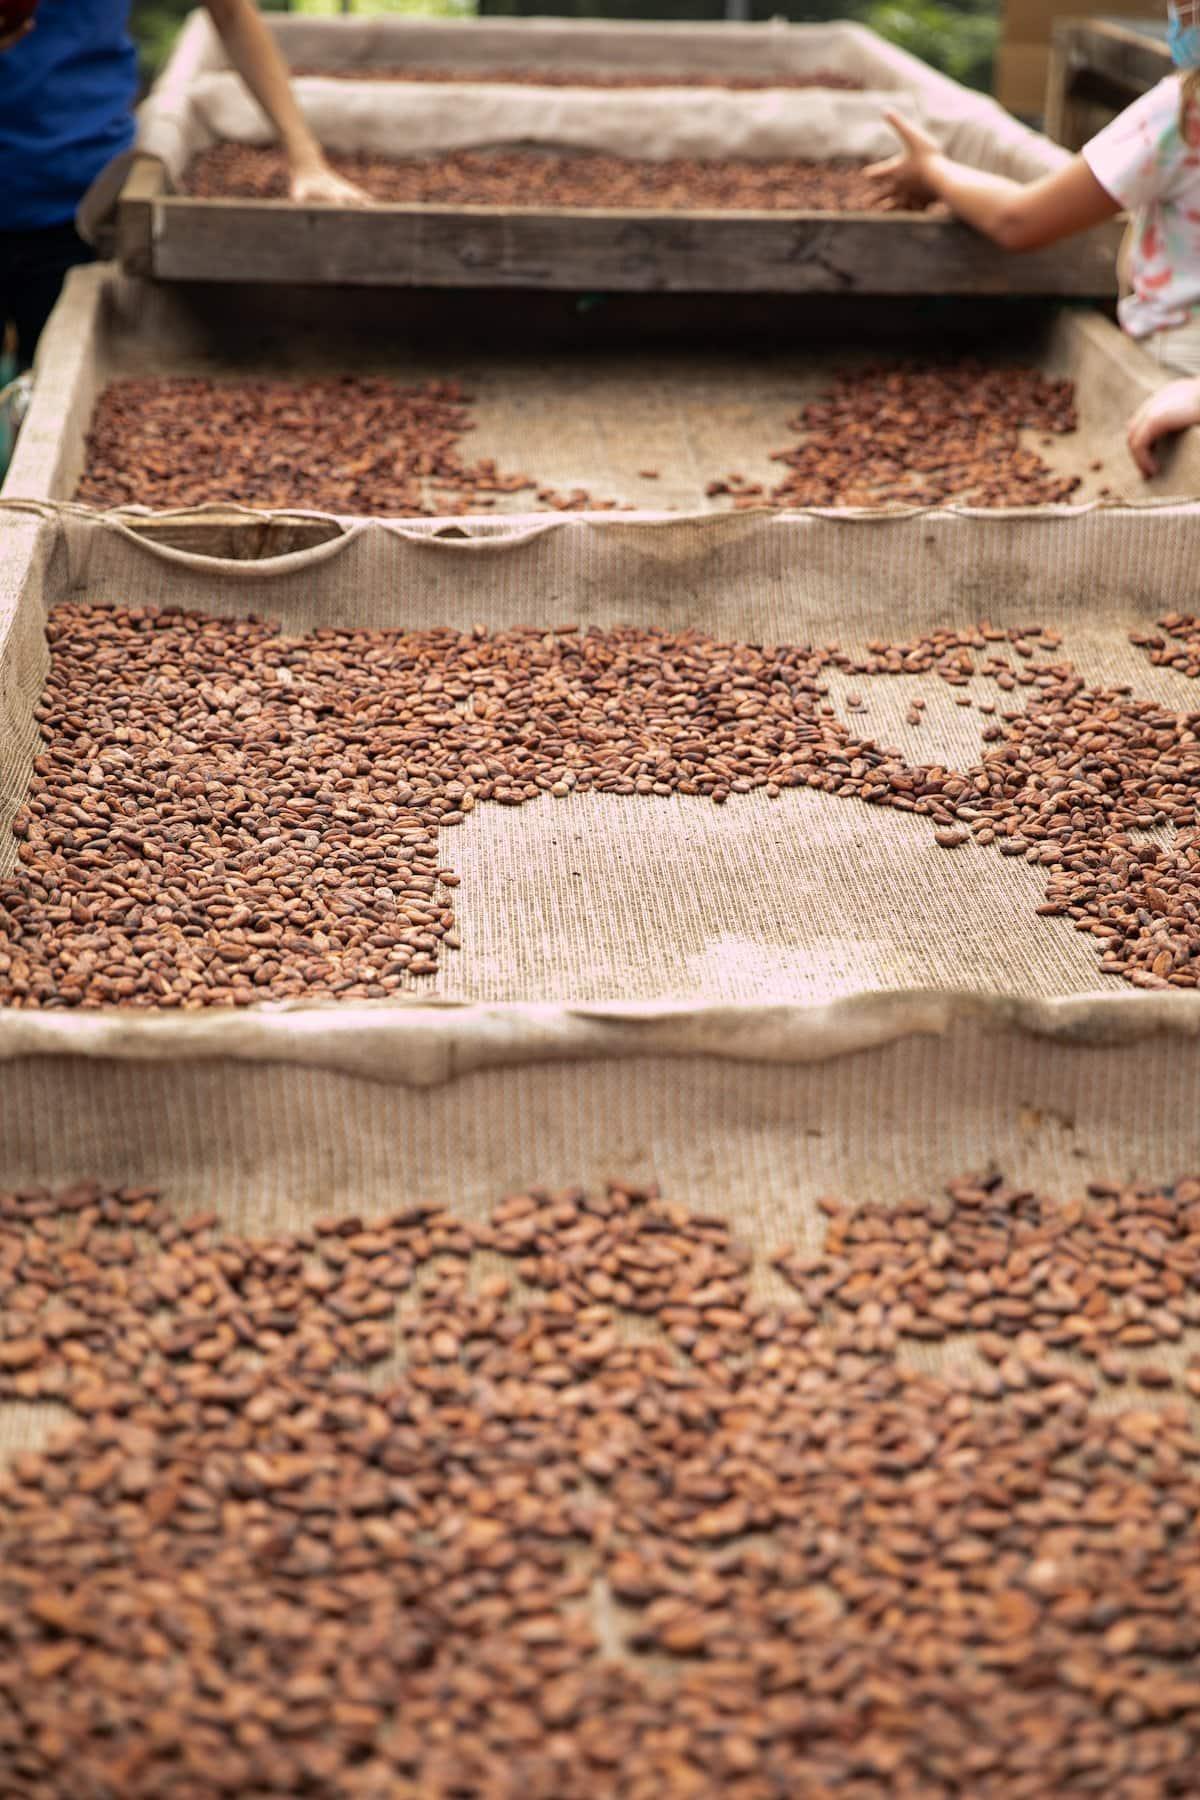 dried cacao